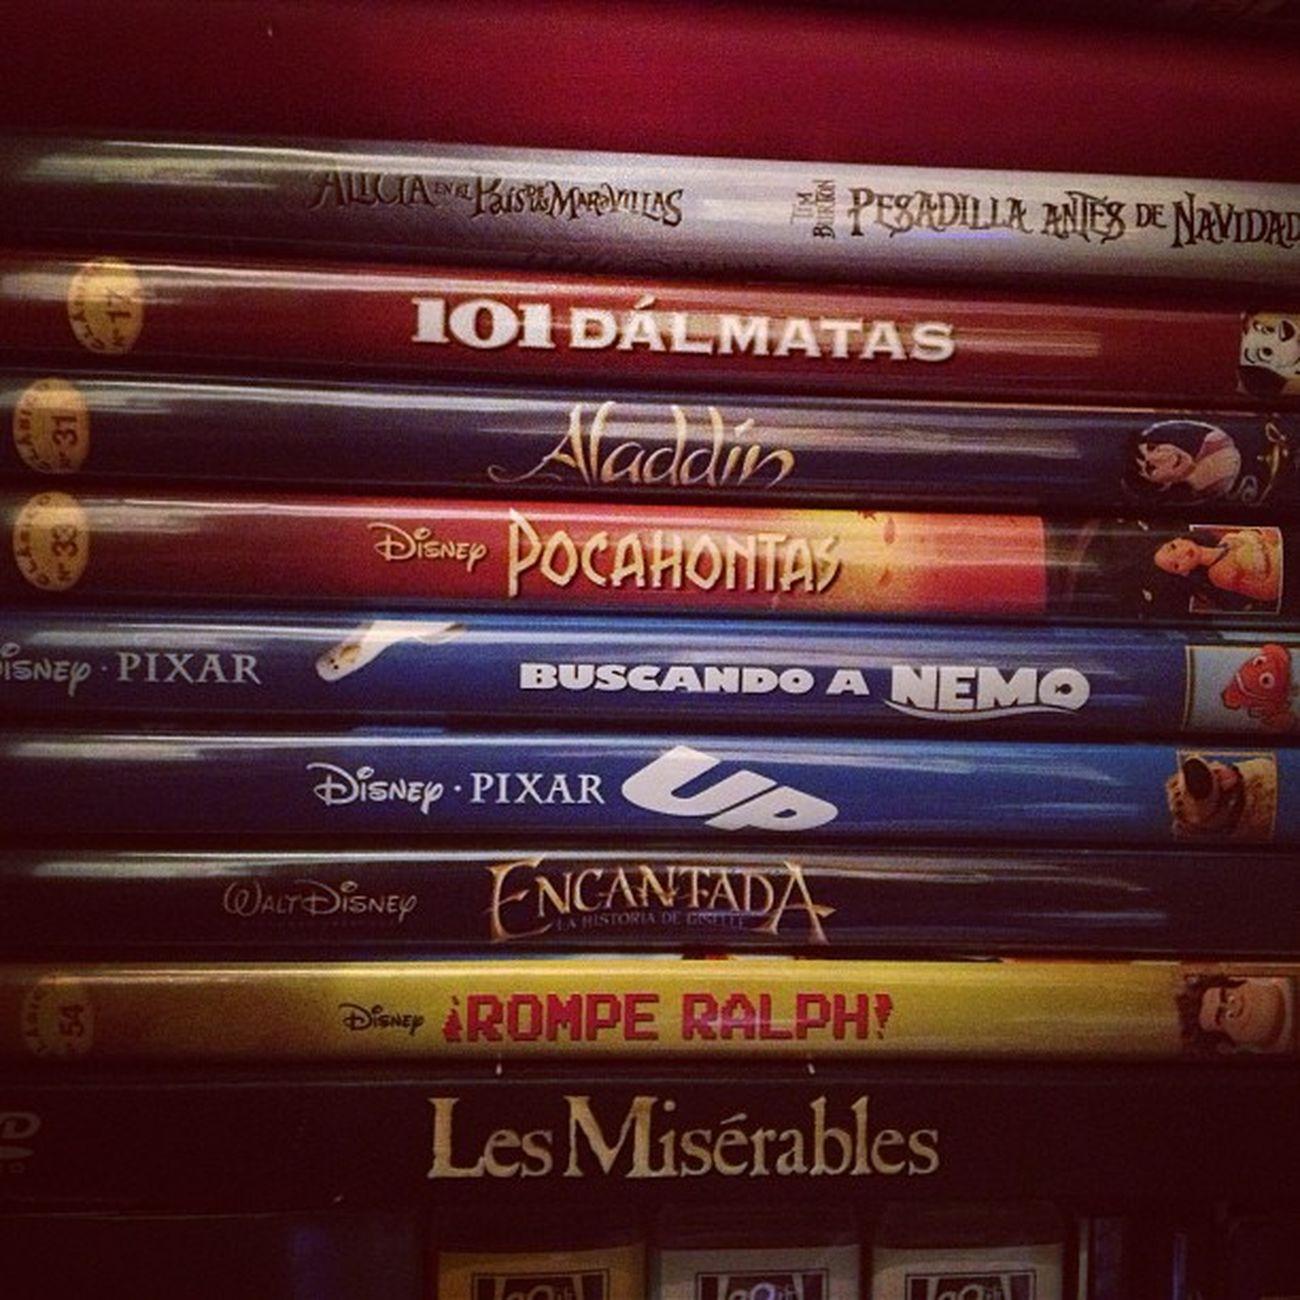 Empieza a crecer! Coleccion Bluray Disney Pixar